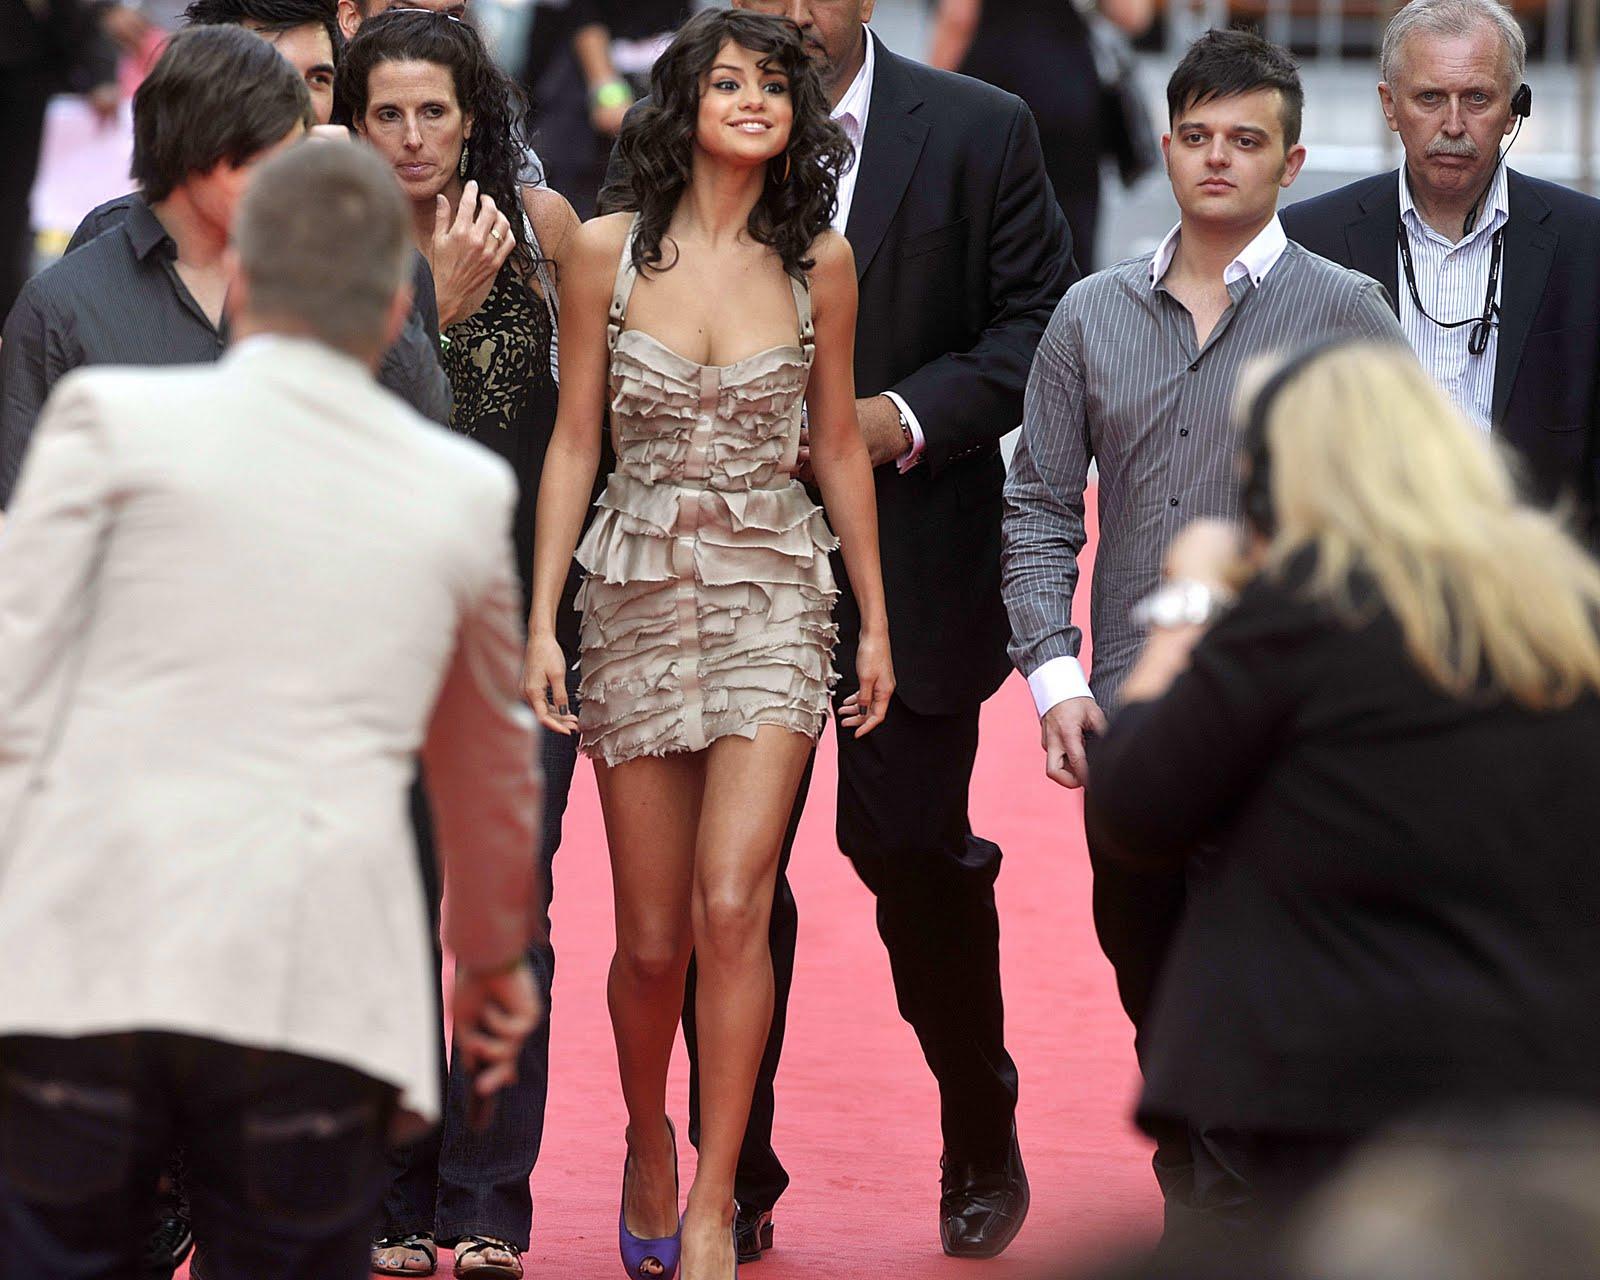 http://4.bp.blogspot.com/-U48zdGM_I8k/TgK9I4gt0tI/AAAAAAAAA0c/ZJYtwQRlNzc/s1600/Selena+Gomez+%25E2%2580%2593+MuchMusic+Video+Awards+2011+%25281%2529.jpg